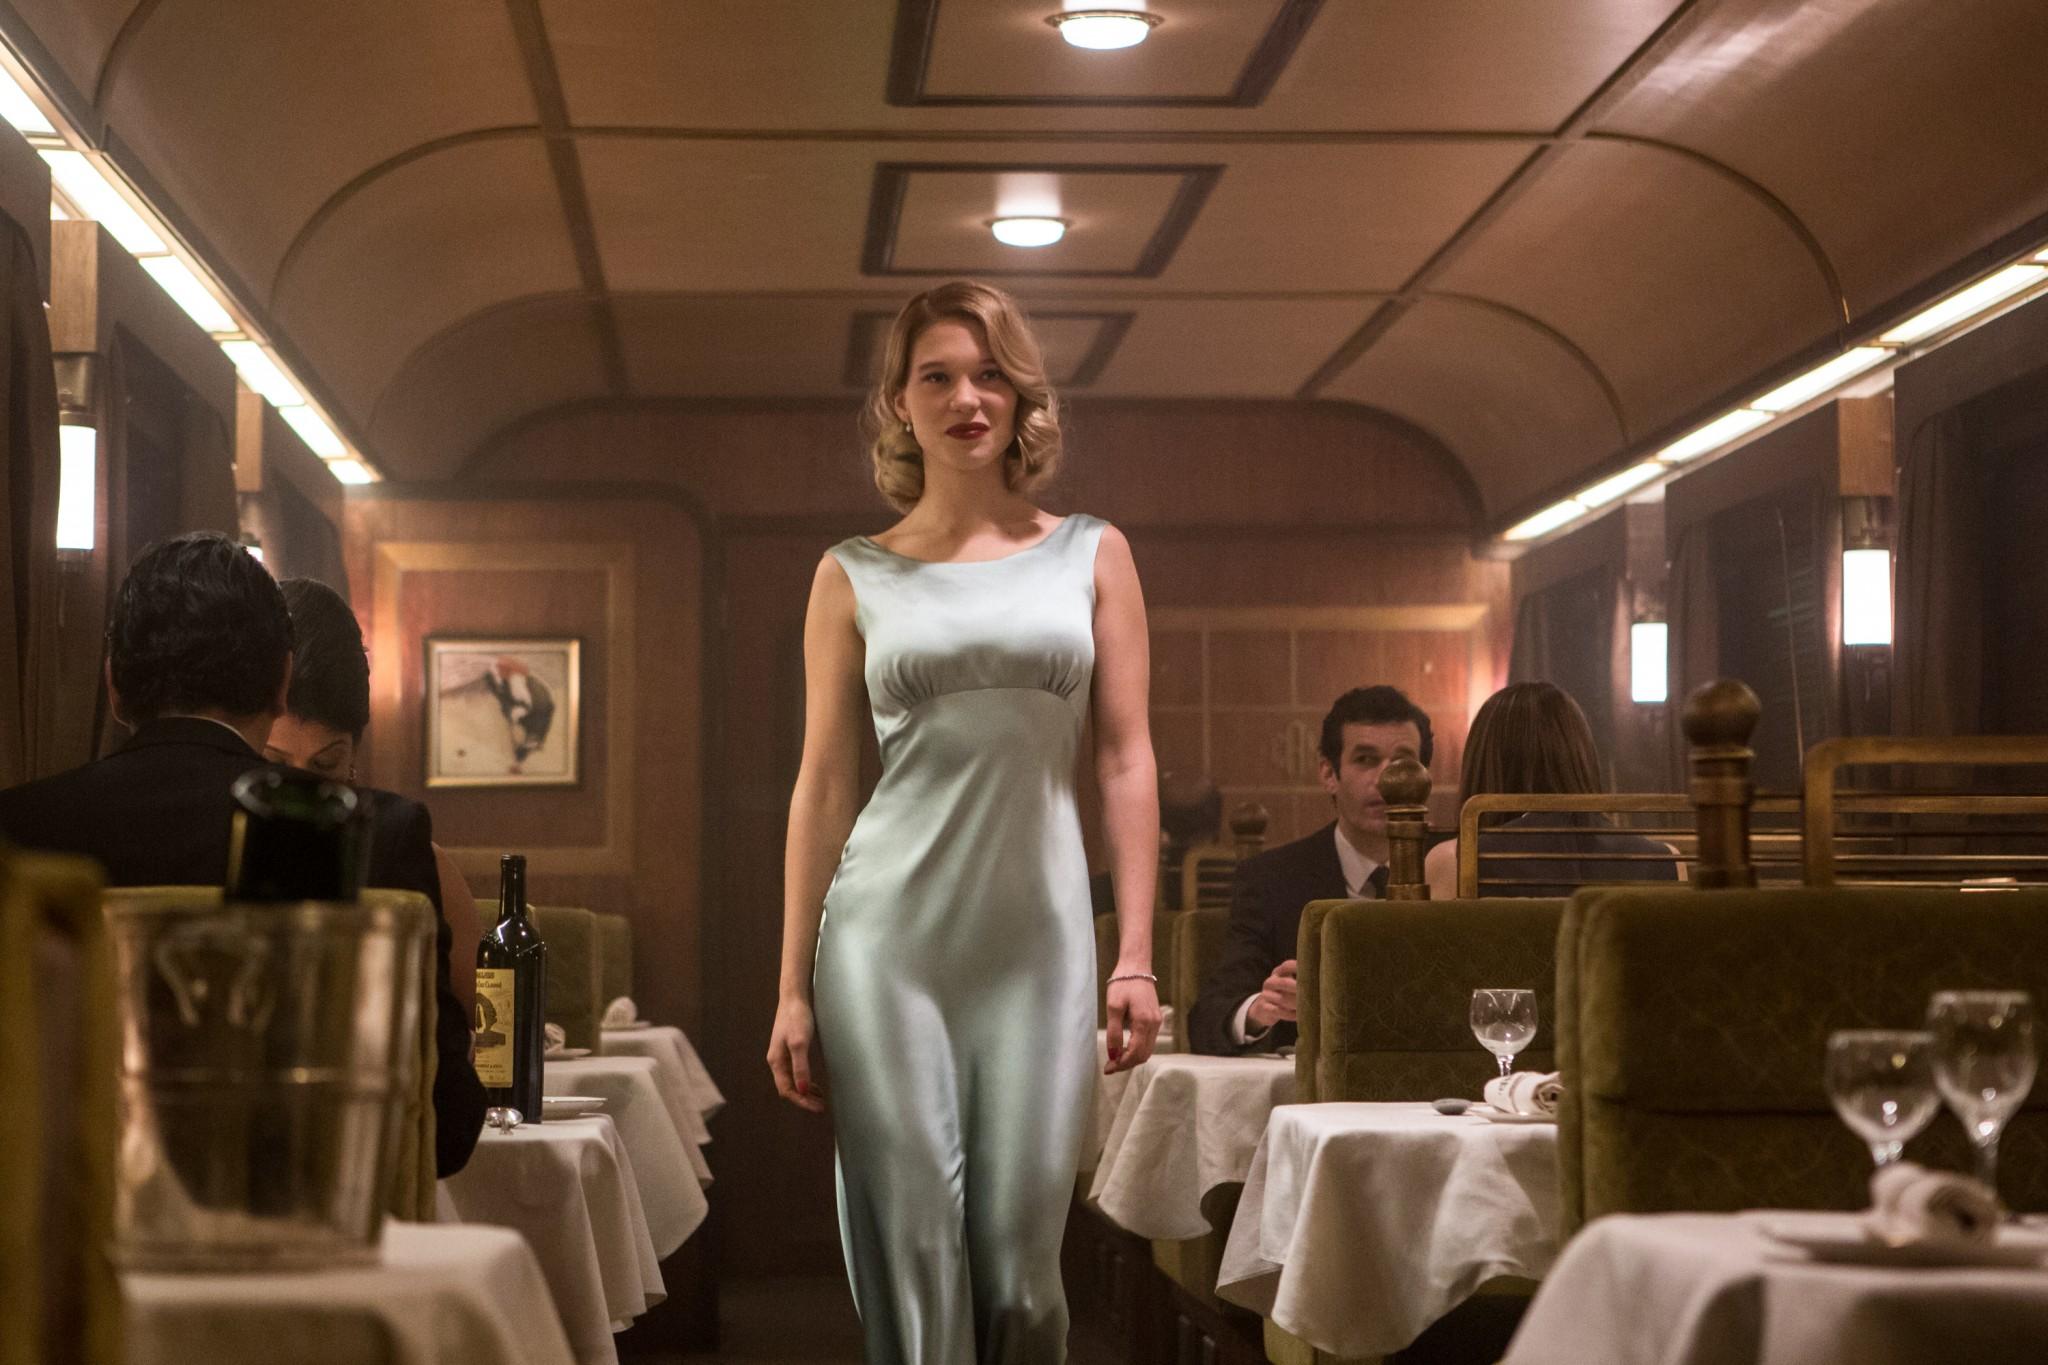 007 Spectre photo film cinéma